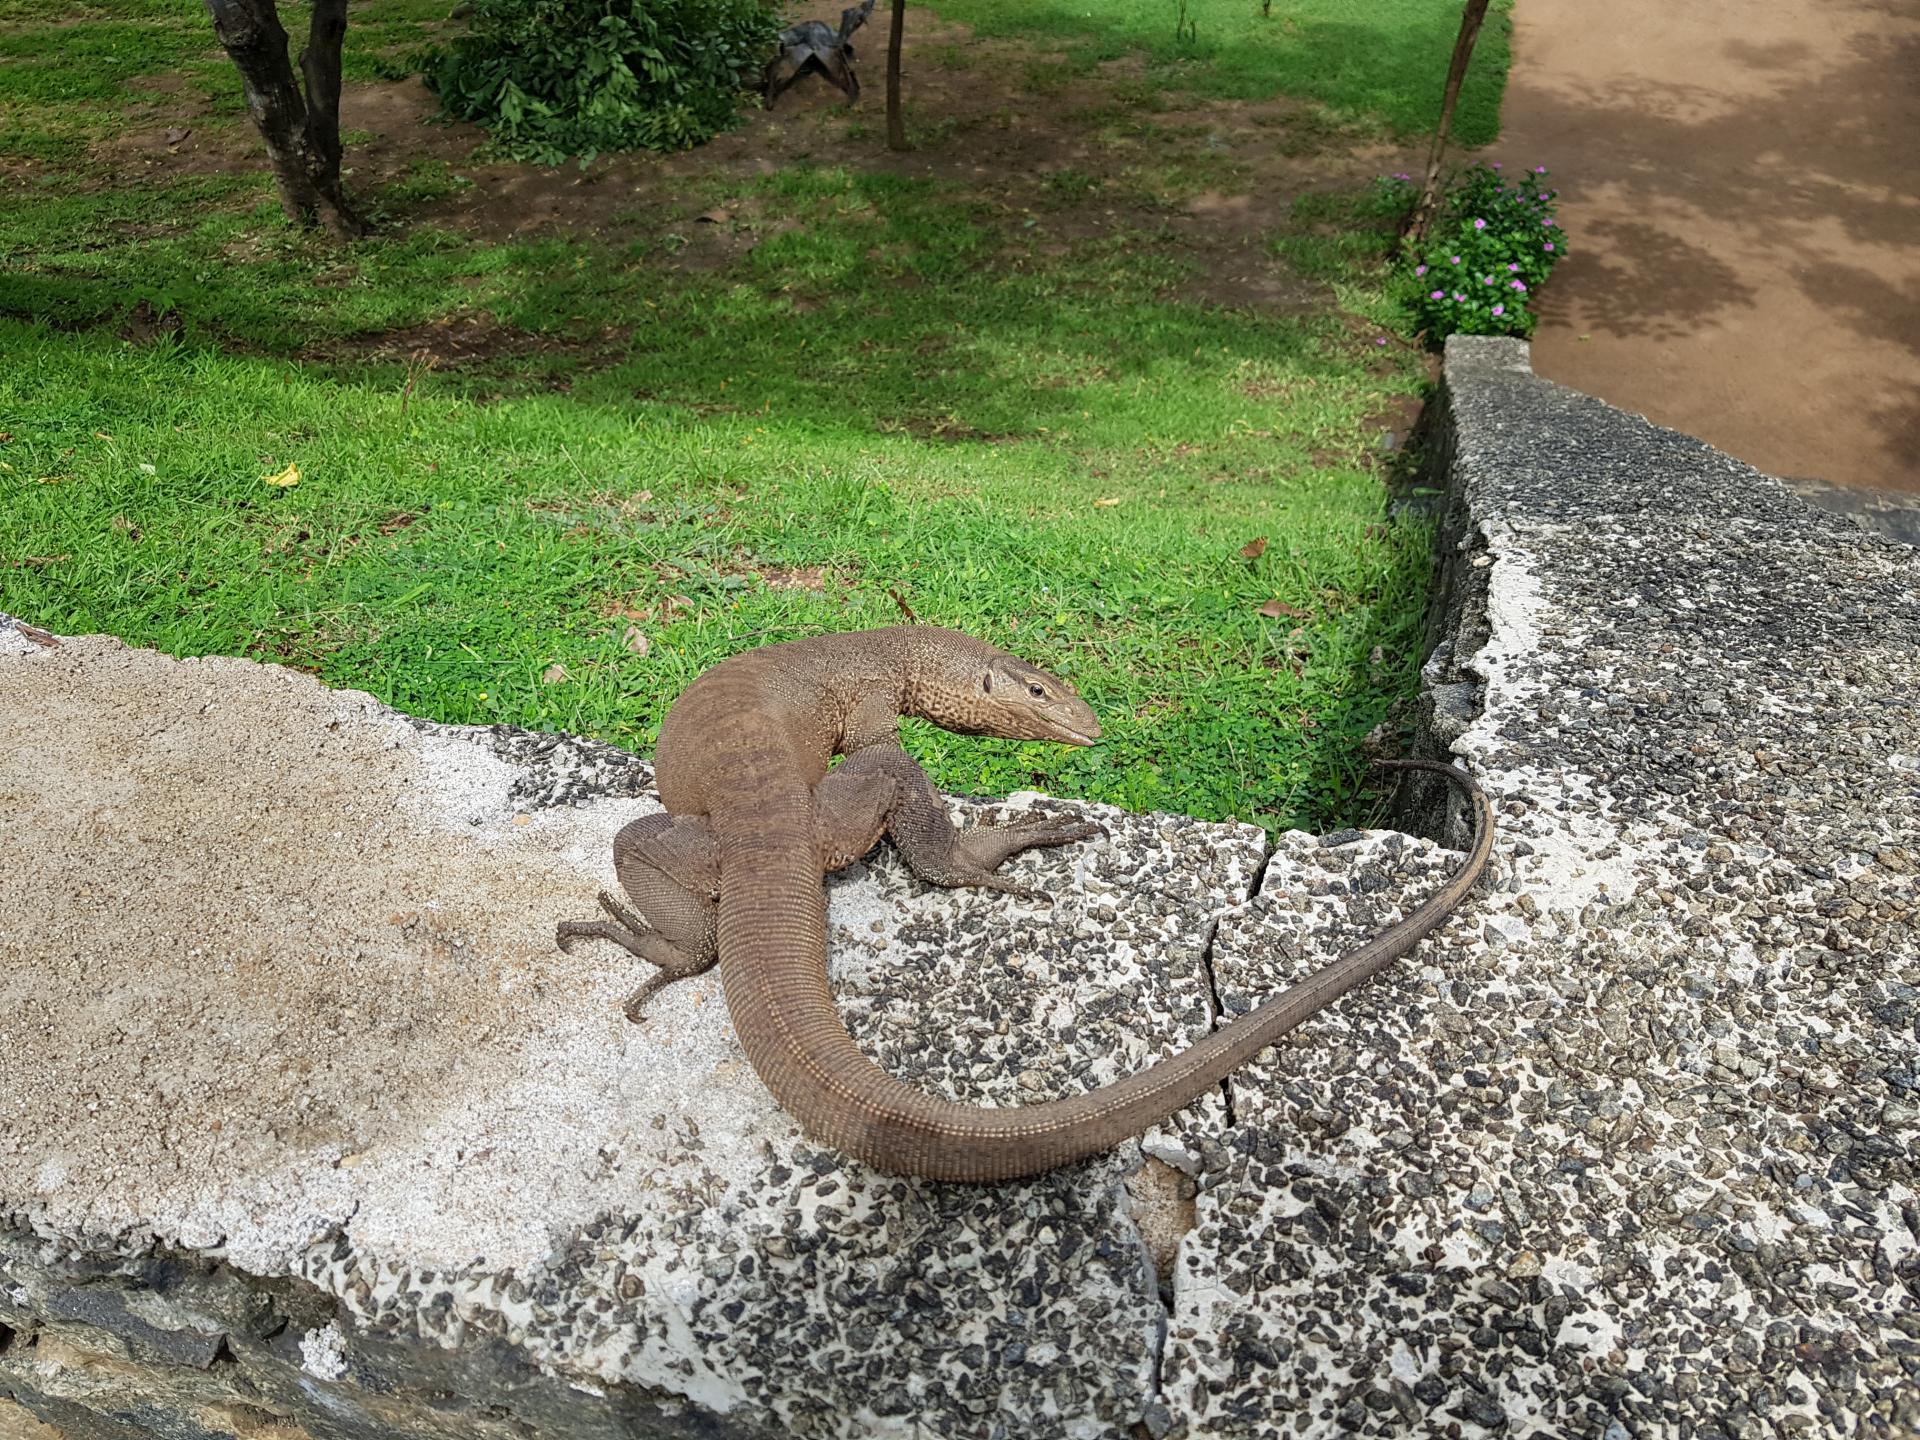 Варан греется на солнышке, Шри-Ланка